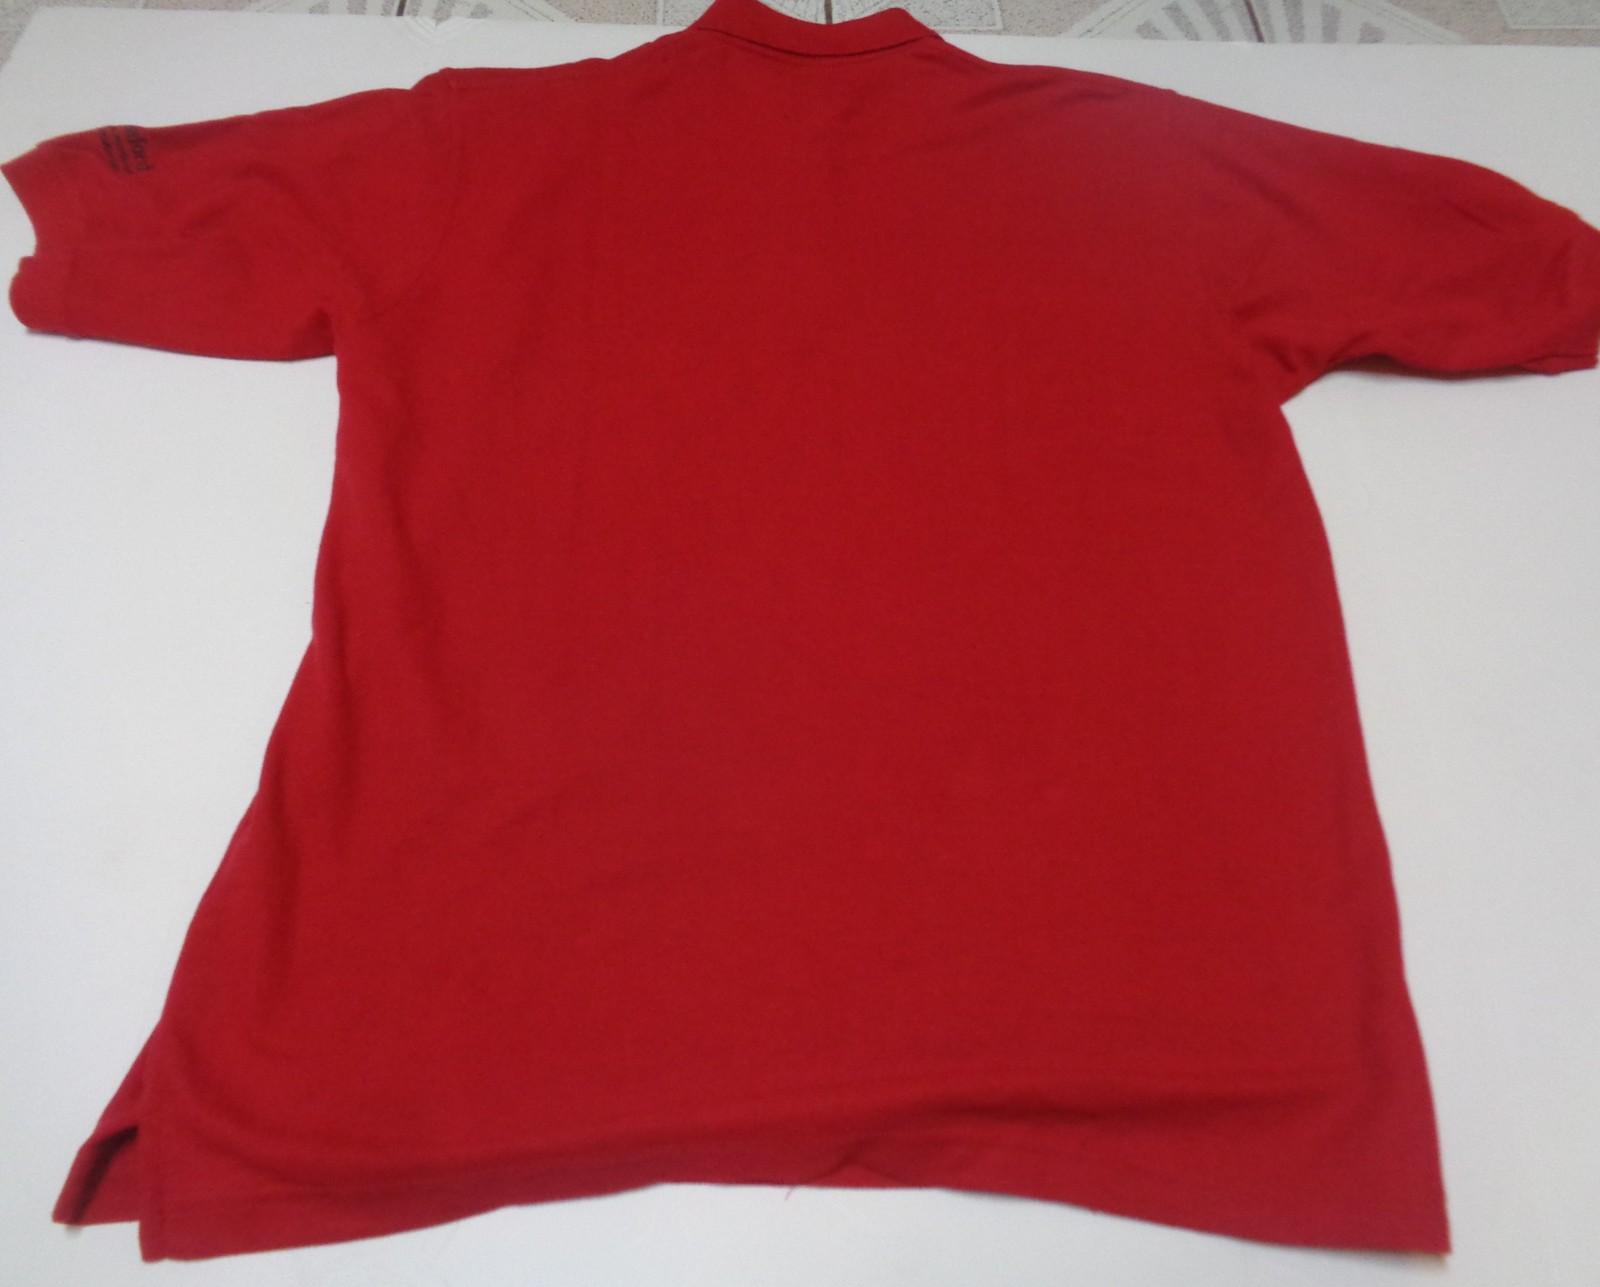 Eco Express Polo Collar Shirt Red NWT Adult Sz L Uniform School Casual Dressy